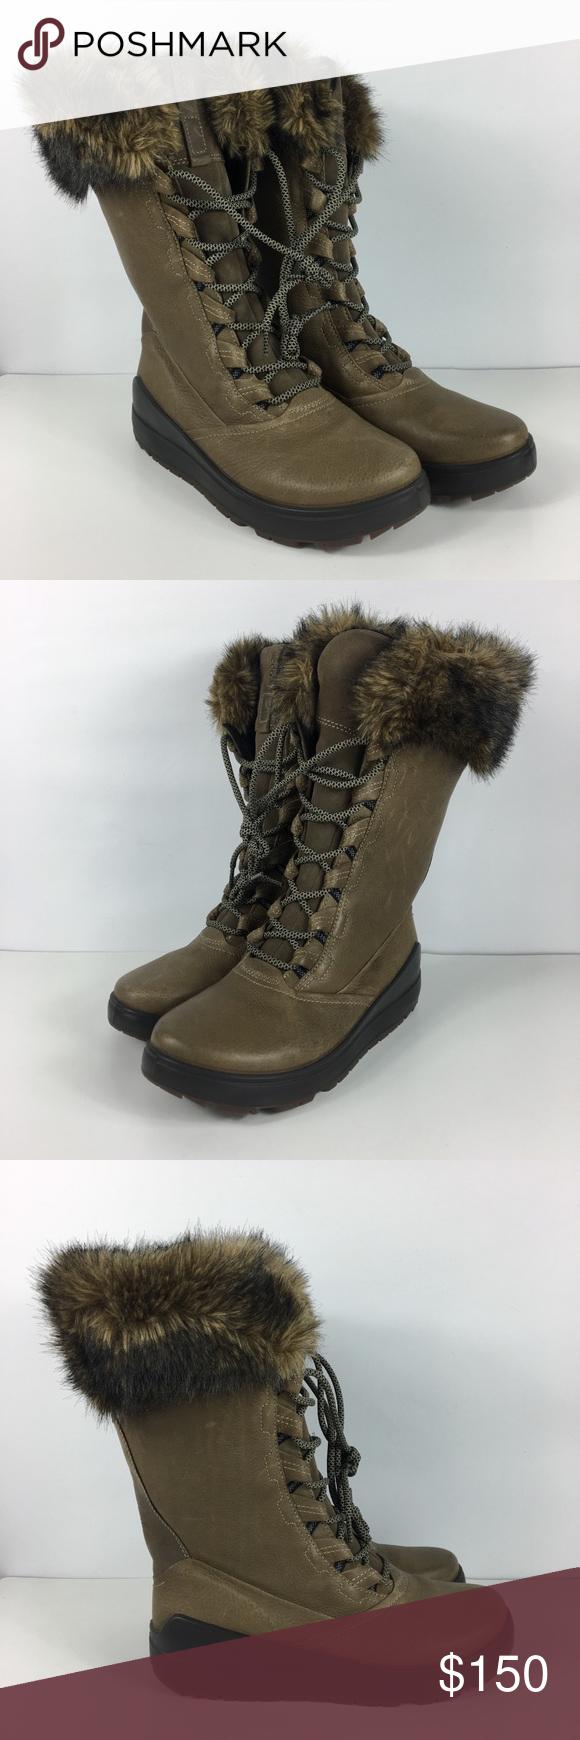 127a8ae521 ECCO Noyce Lite Tall Leather Winter Snow Boots | My Posh Closet ...